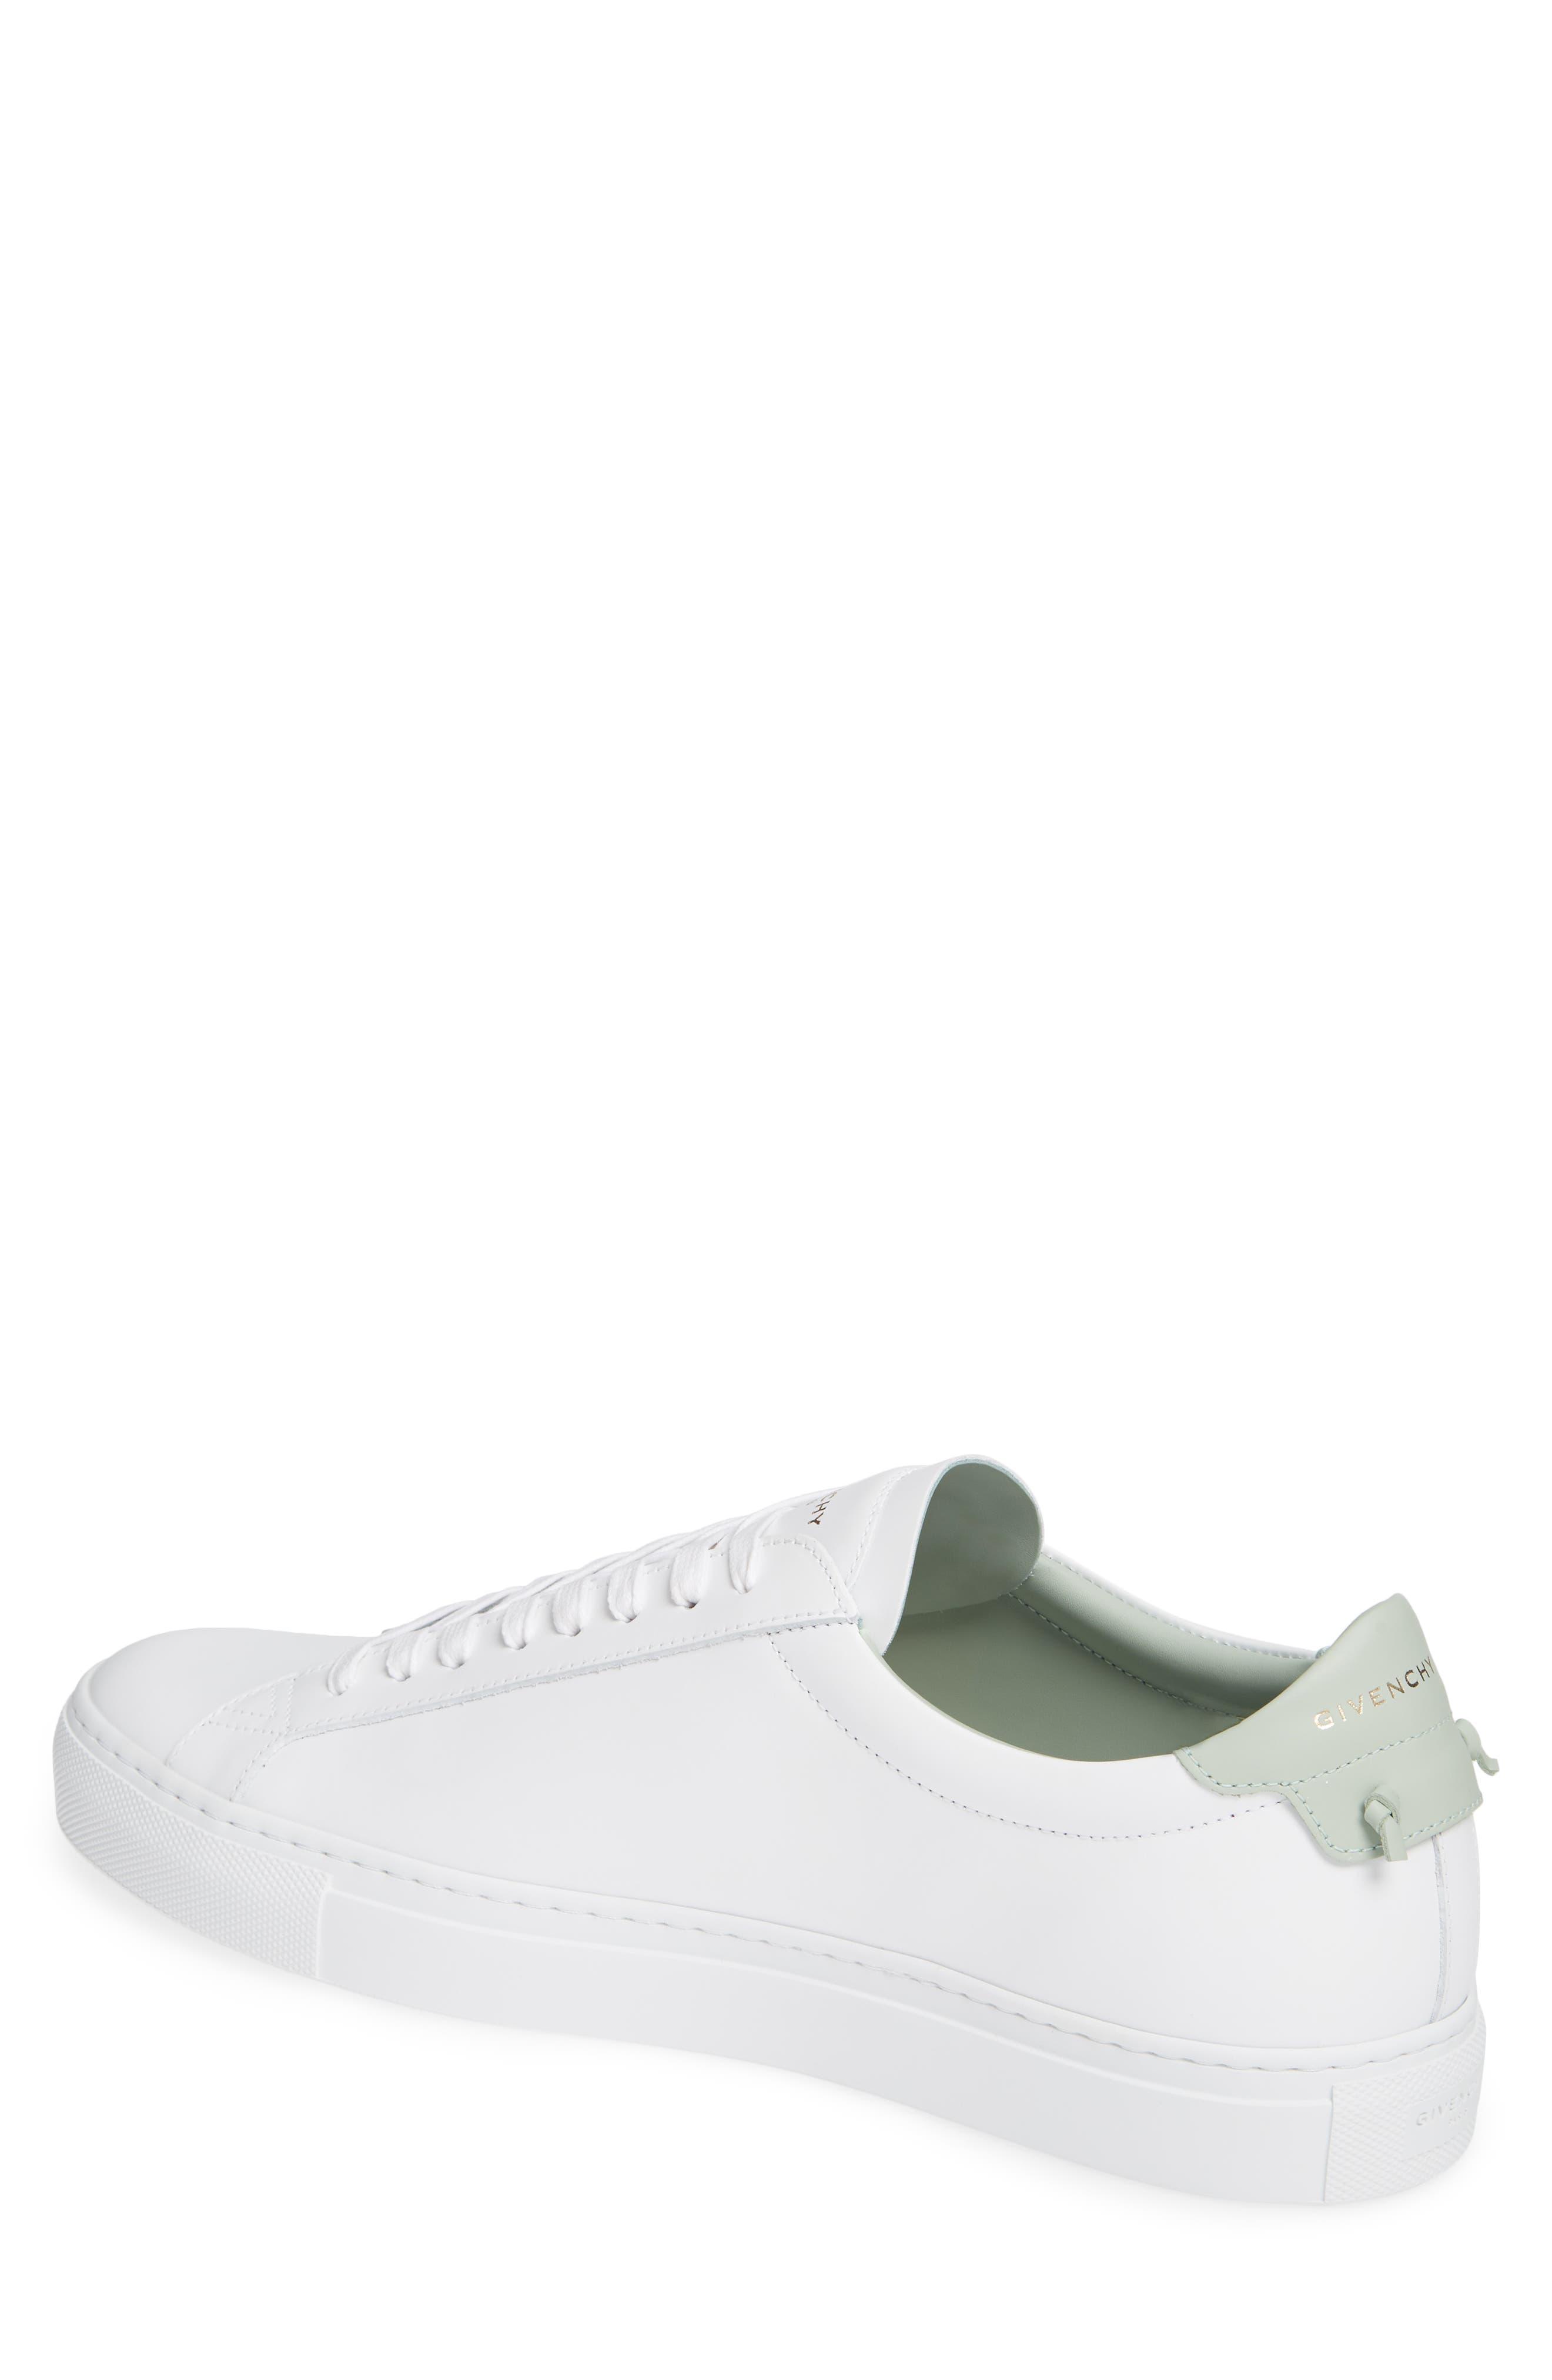 'Urban Knots Lo' Sneaker,                             Alternate thumbnail 2, color,                             WHITE/ GREEN